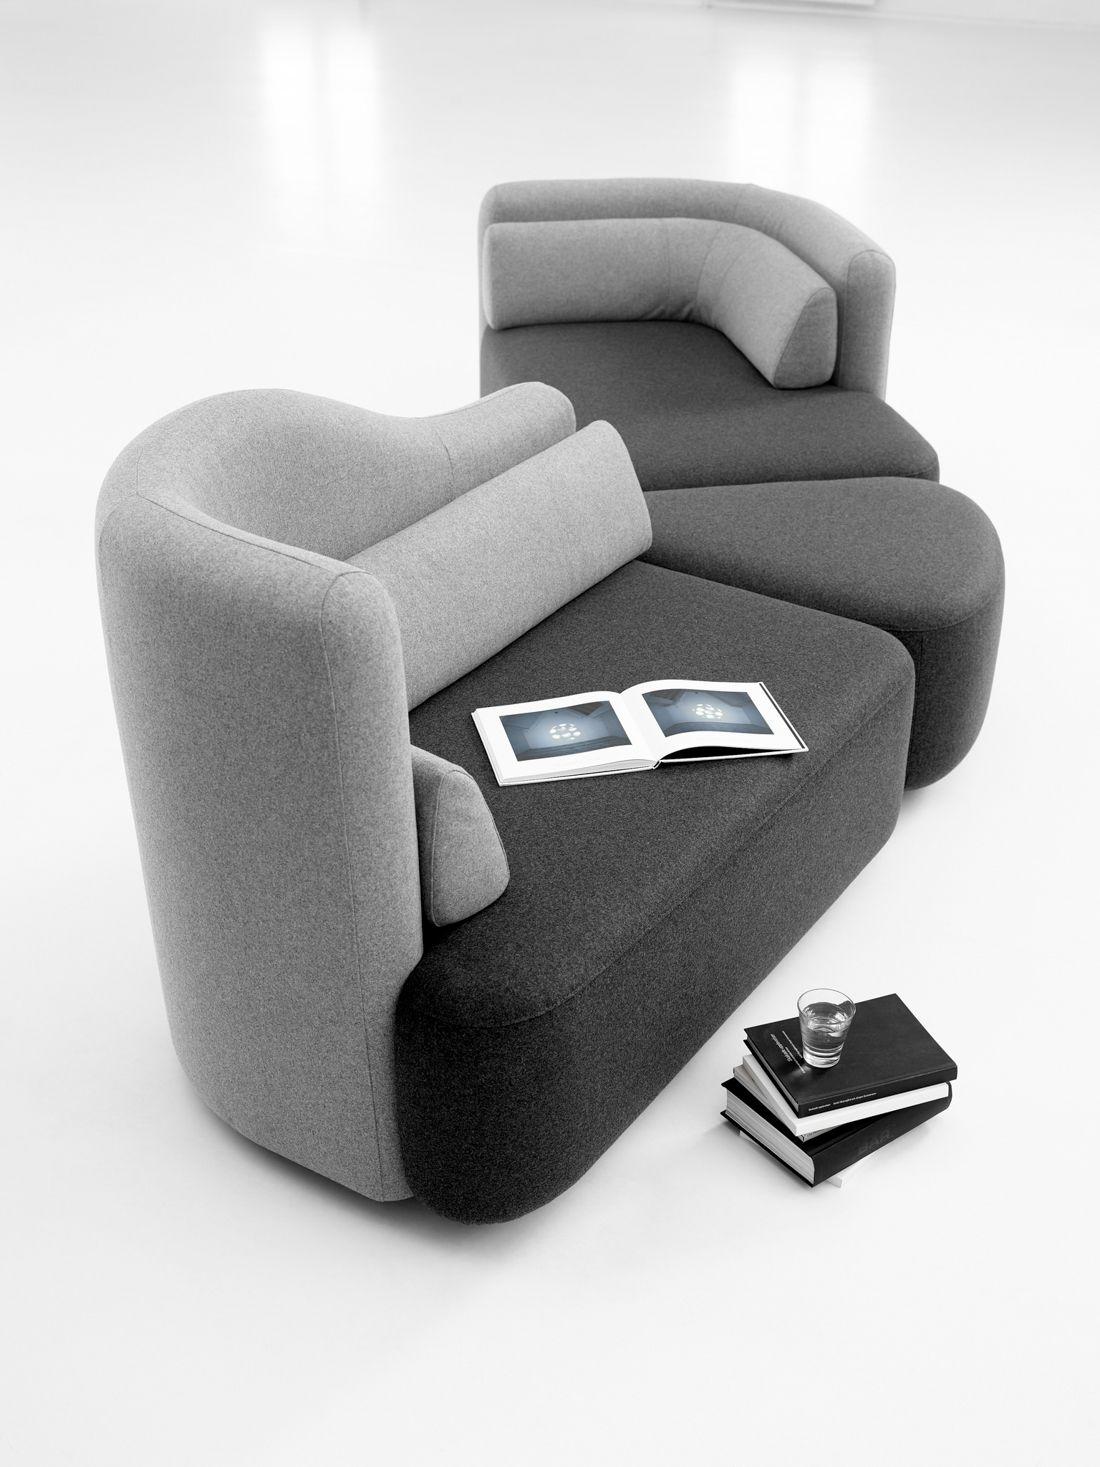 Karim Rashid Updates His Ottawa Collection For Boconcept Nordic Design Chairs Furniture Boconcept